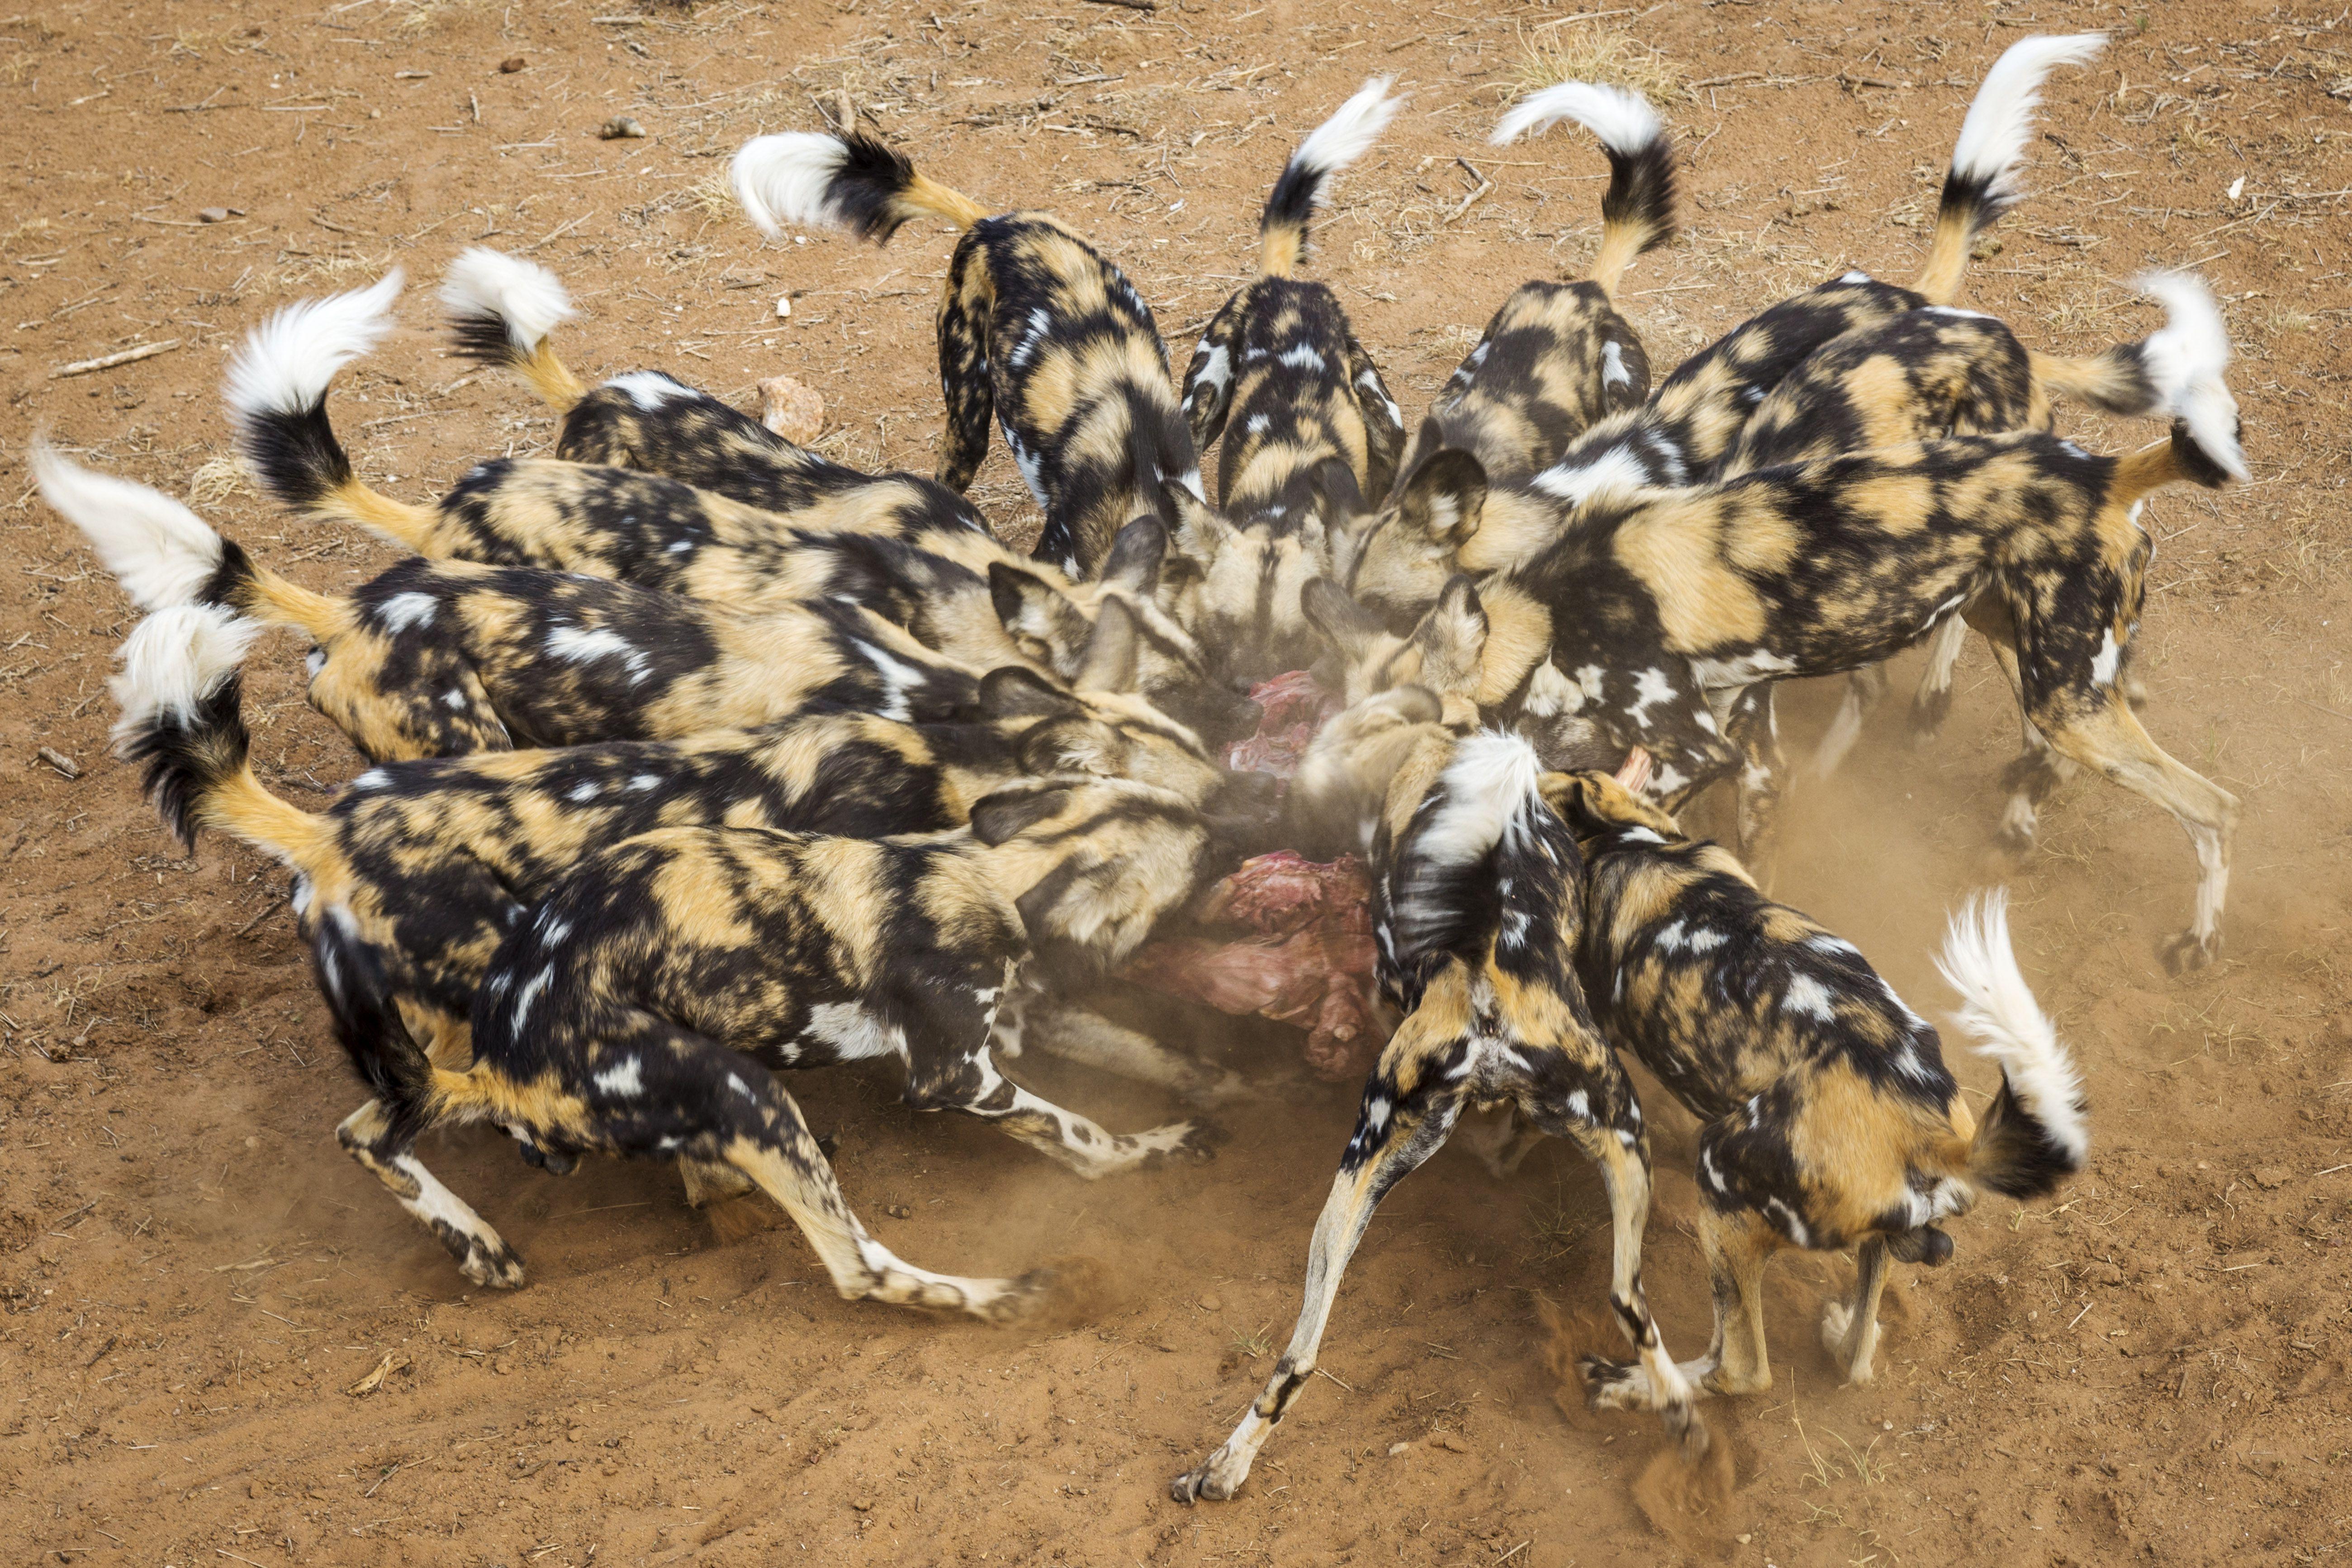 African Wild Dog Facts: Diet, Behavior, Habitat